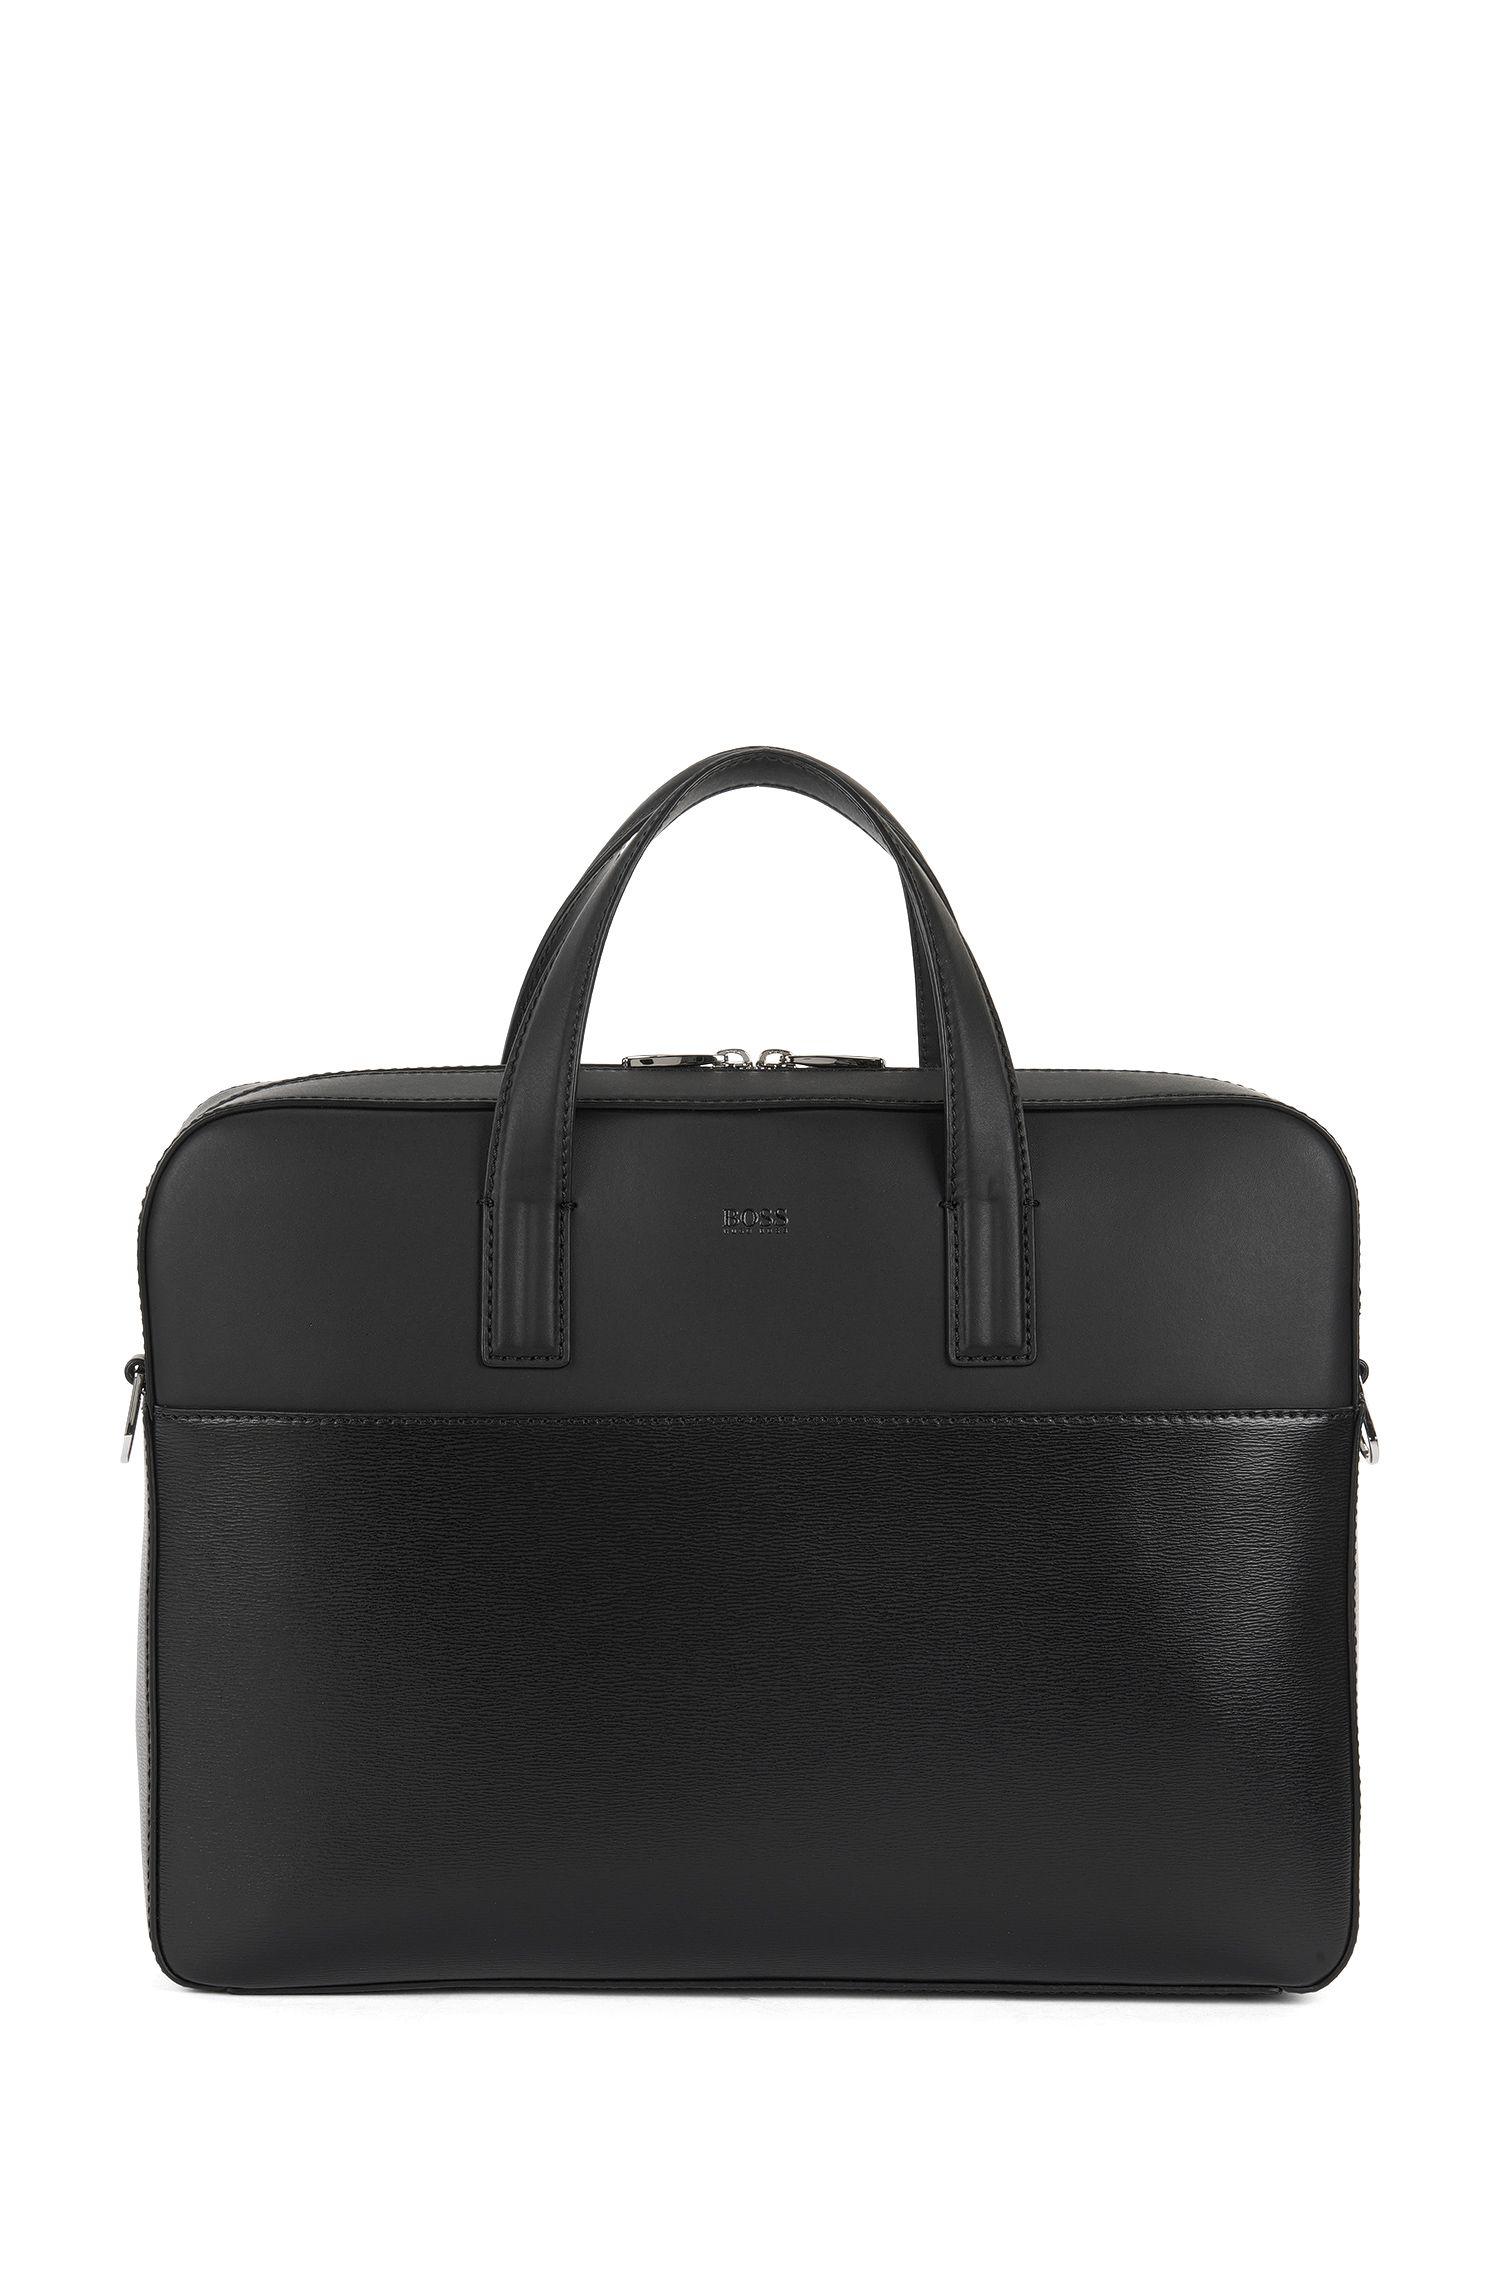 Leather Bag | Focus S Doc